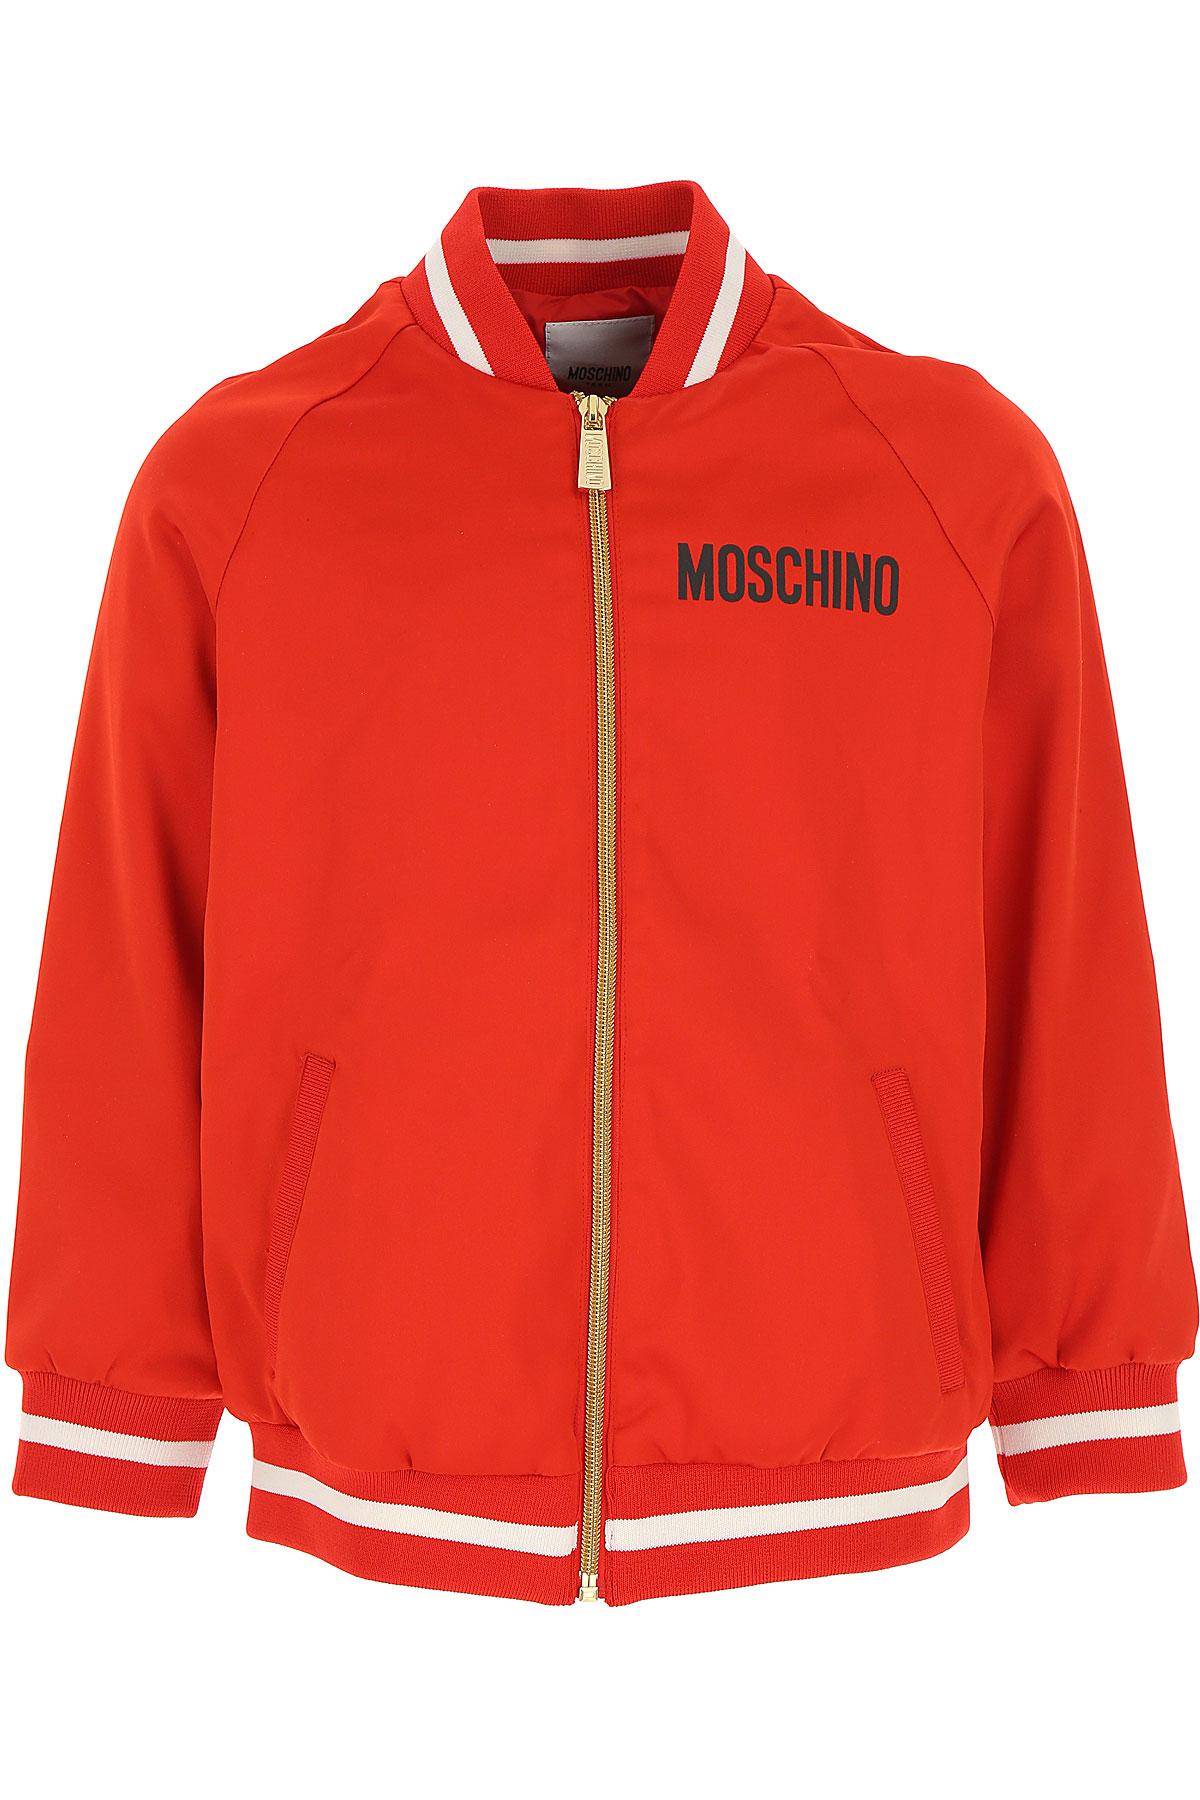 62ff18416 Girls Clothing Moschino, Style code: hda000-lra04-50316